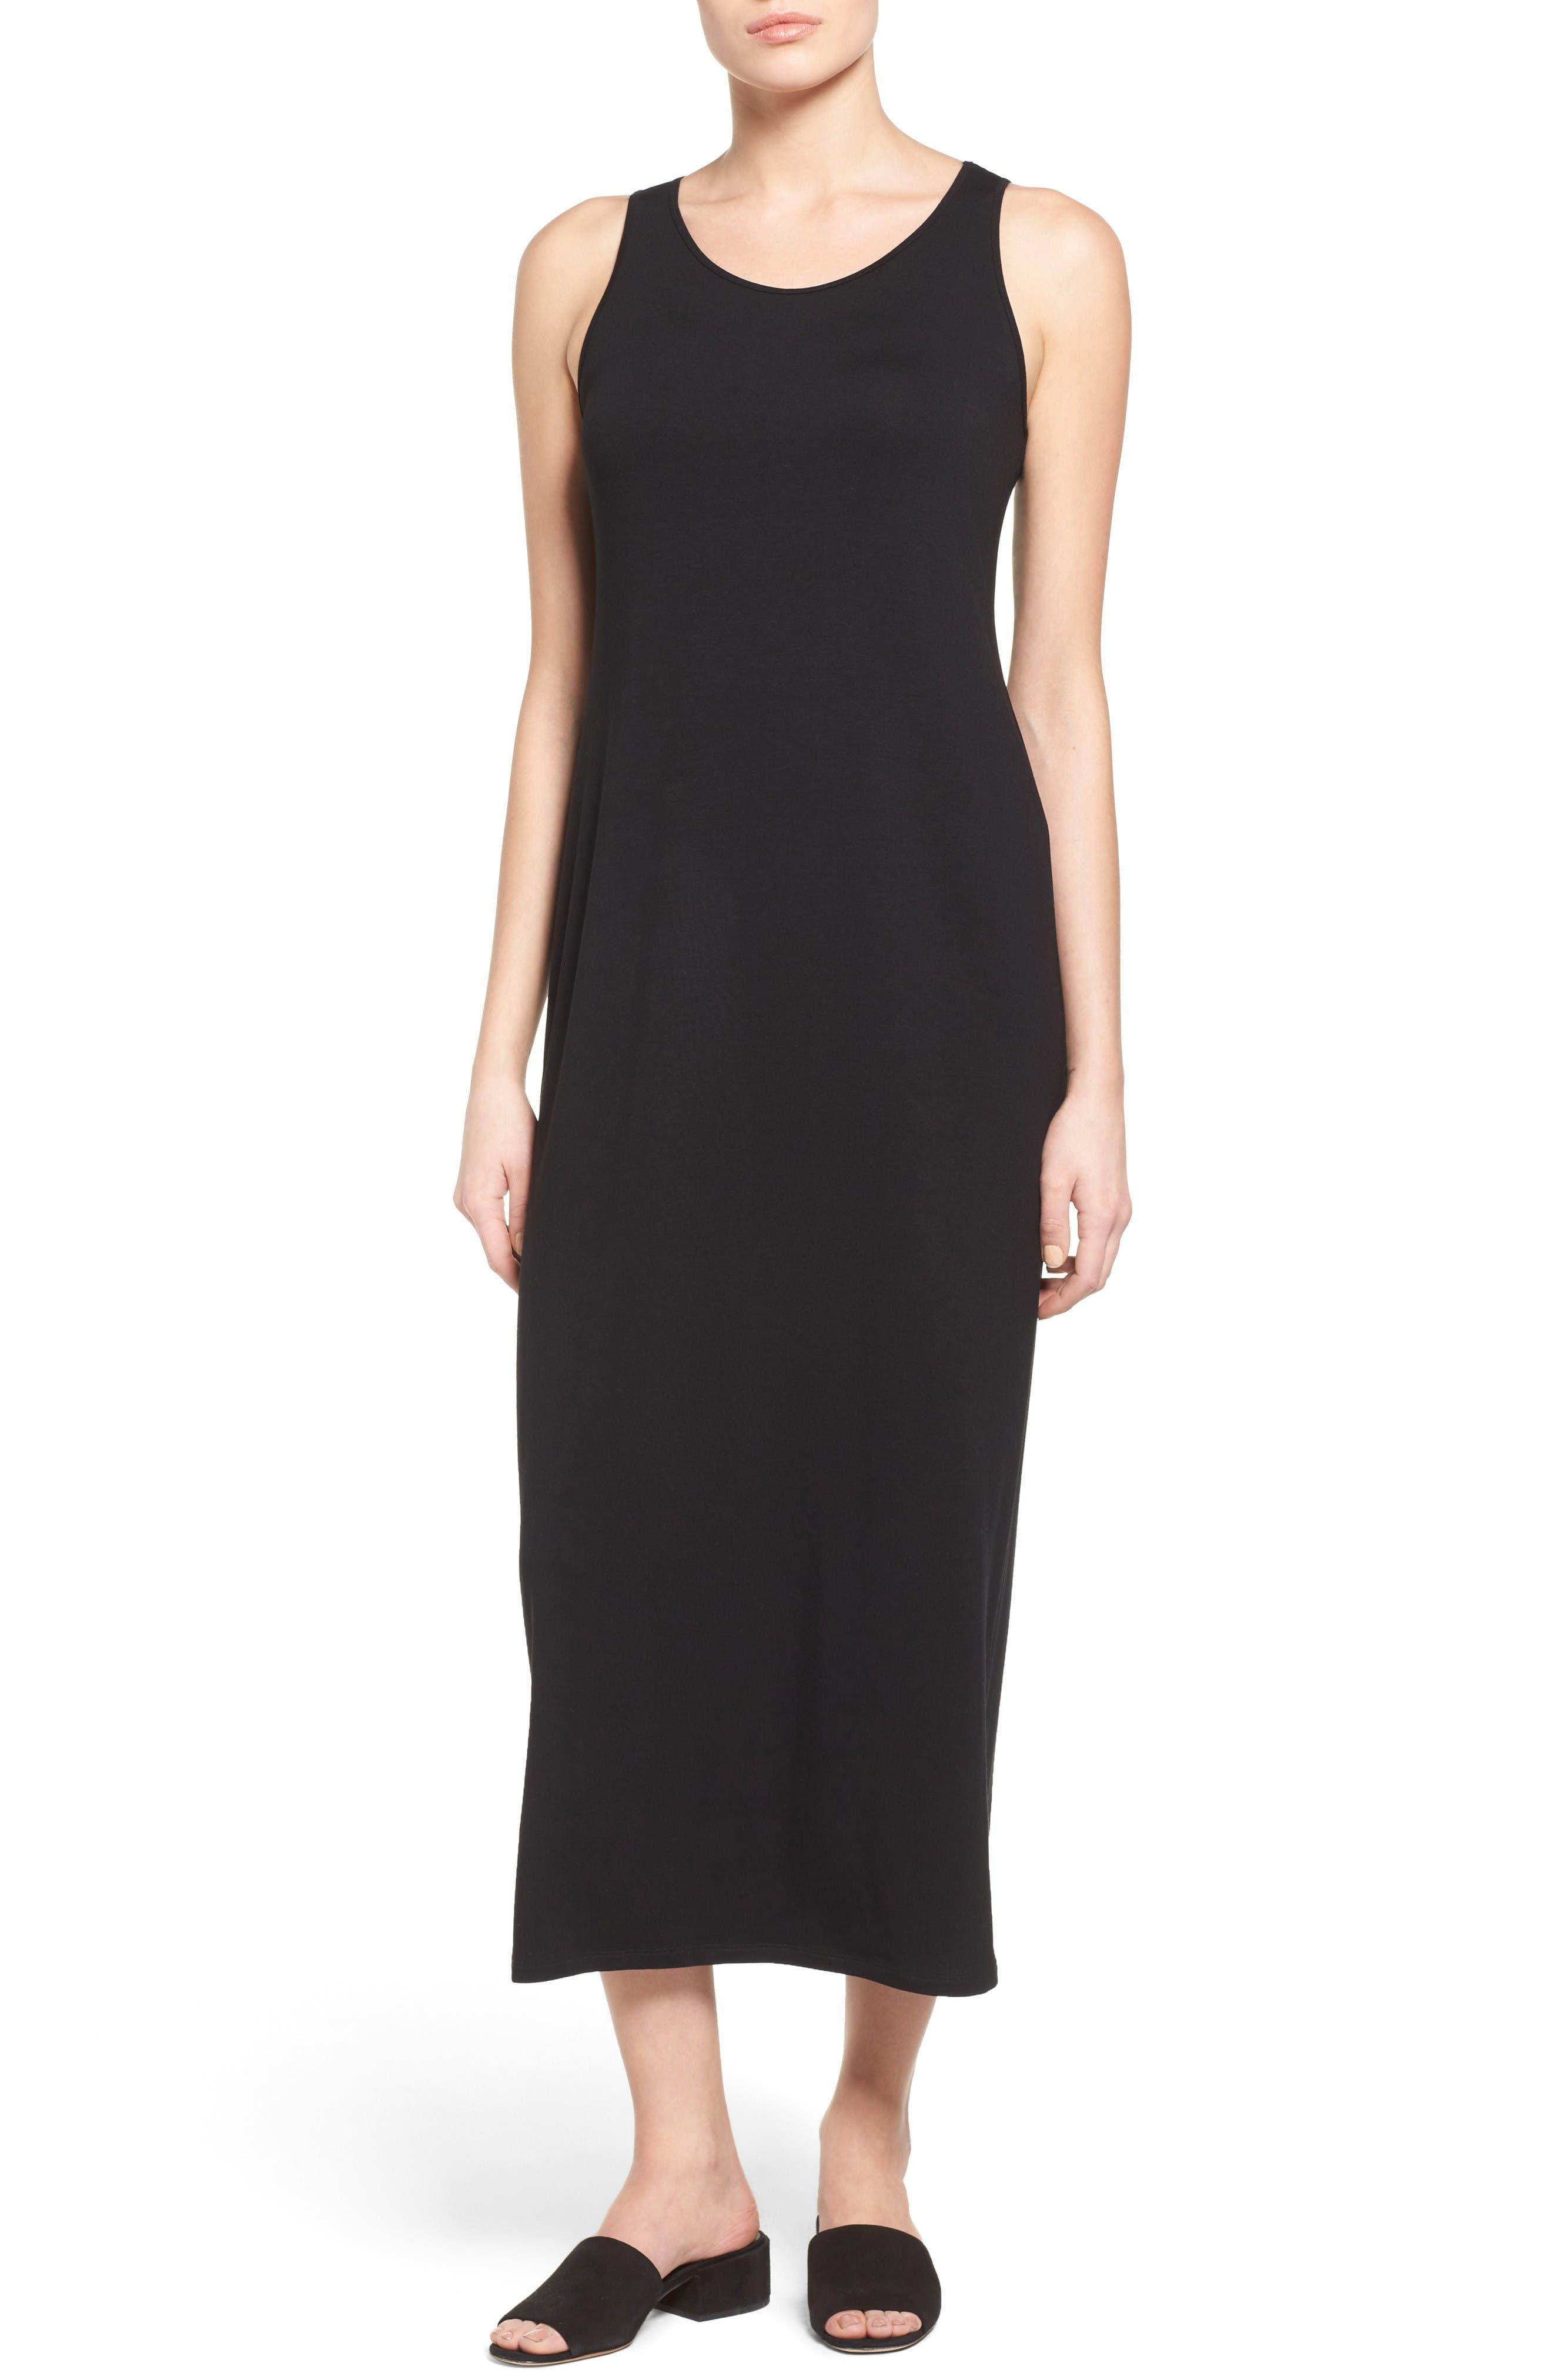 Alternate Image 1 Selected - Eileen Fisher Midi Tank Dress (Regular & Petite)